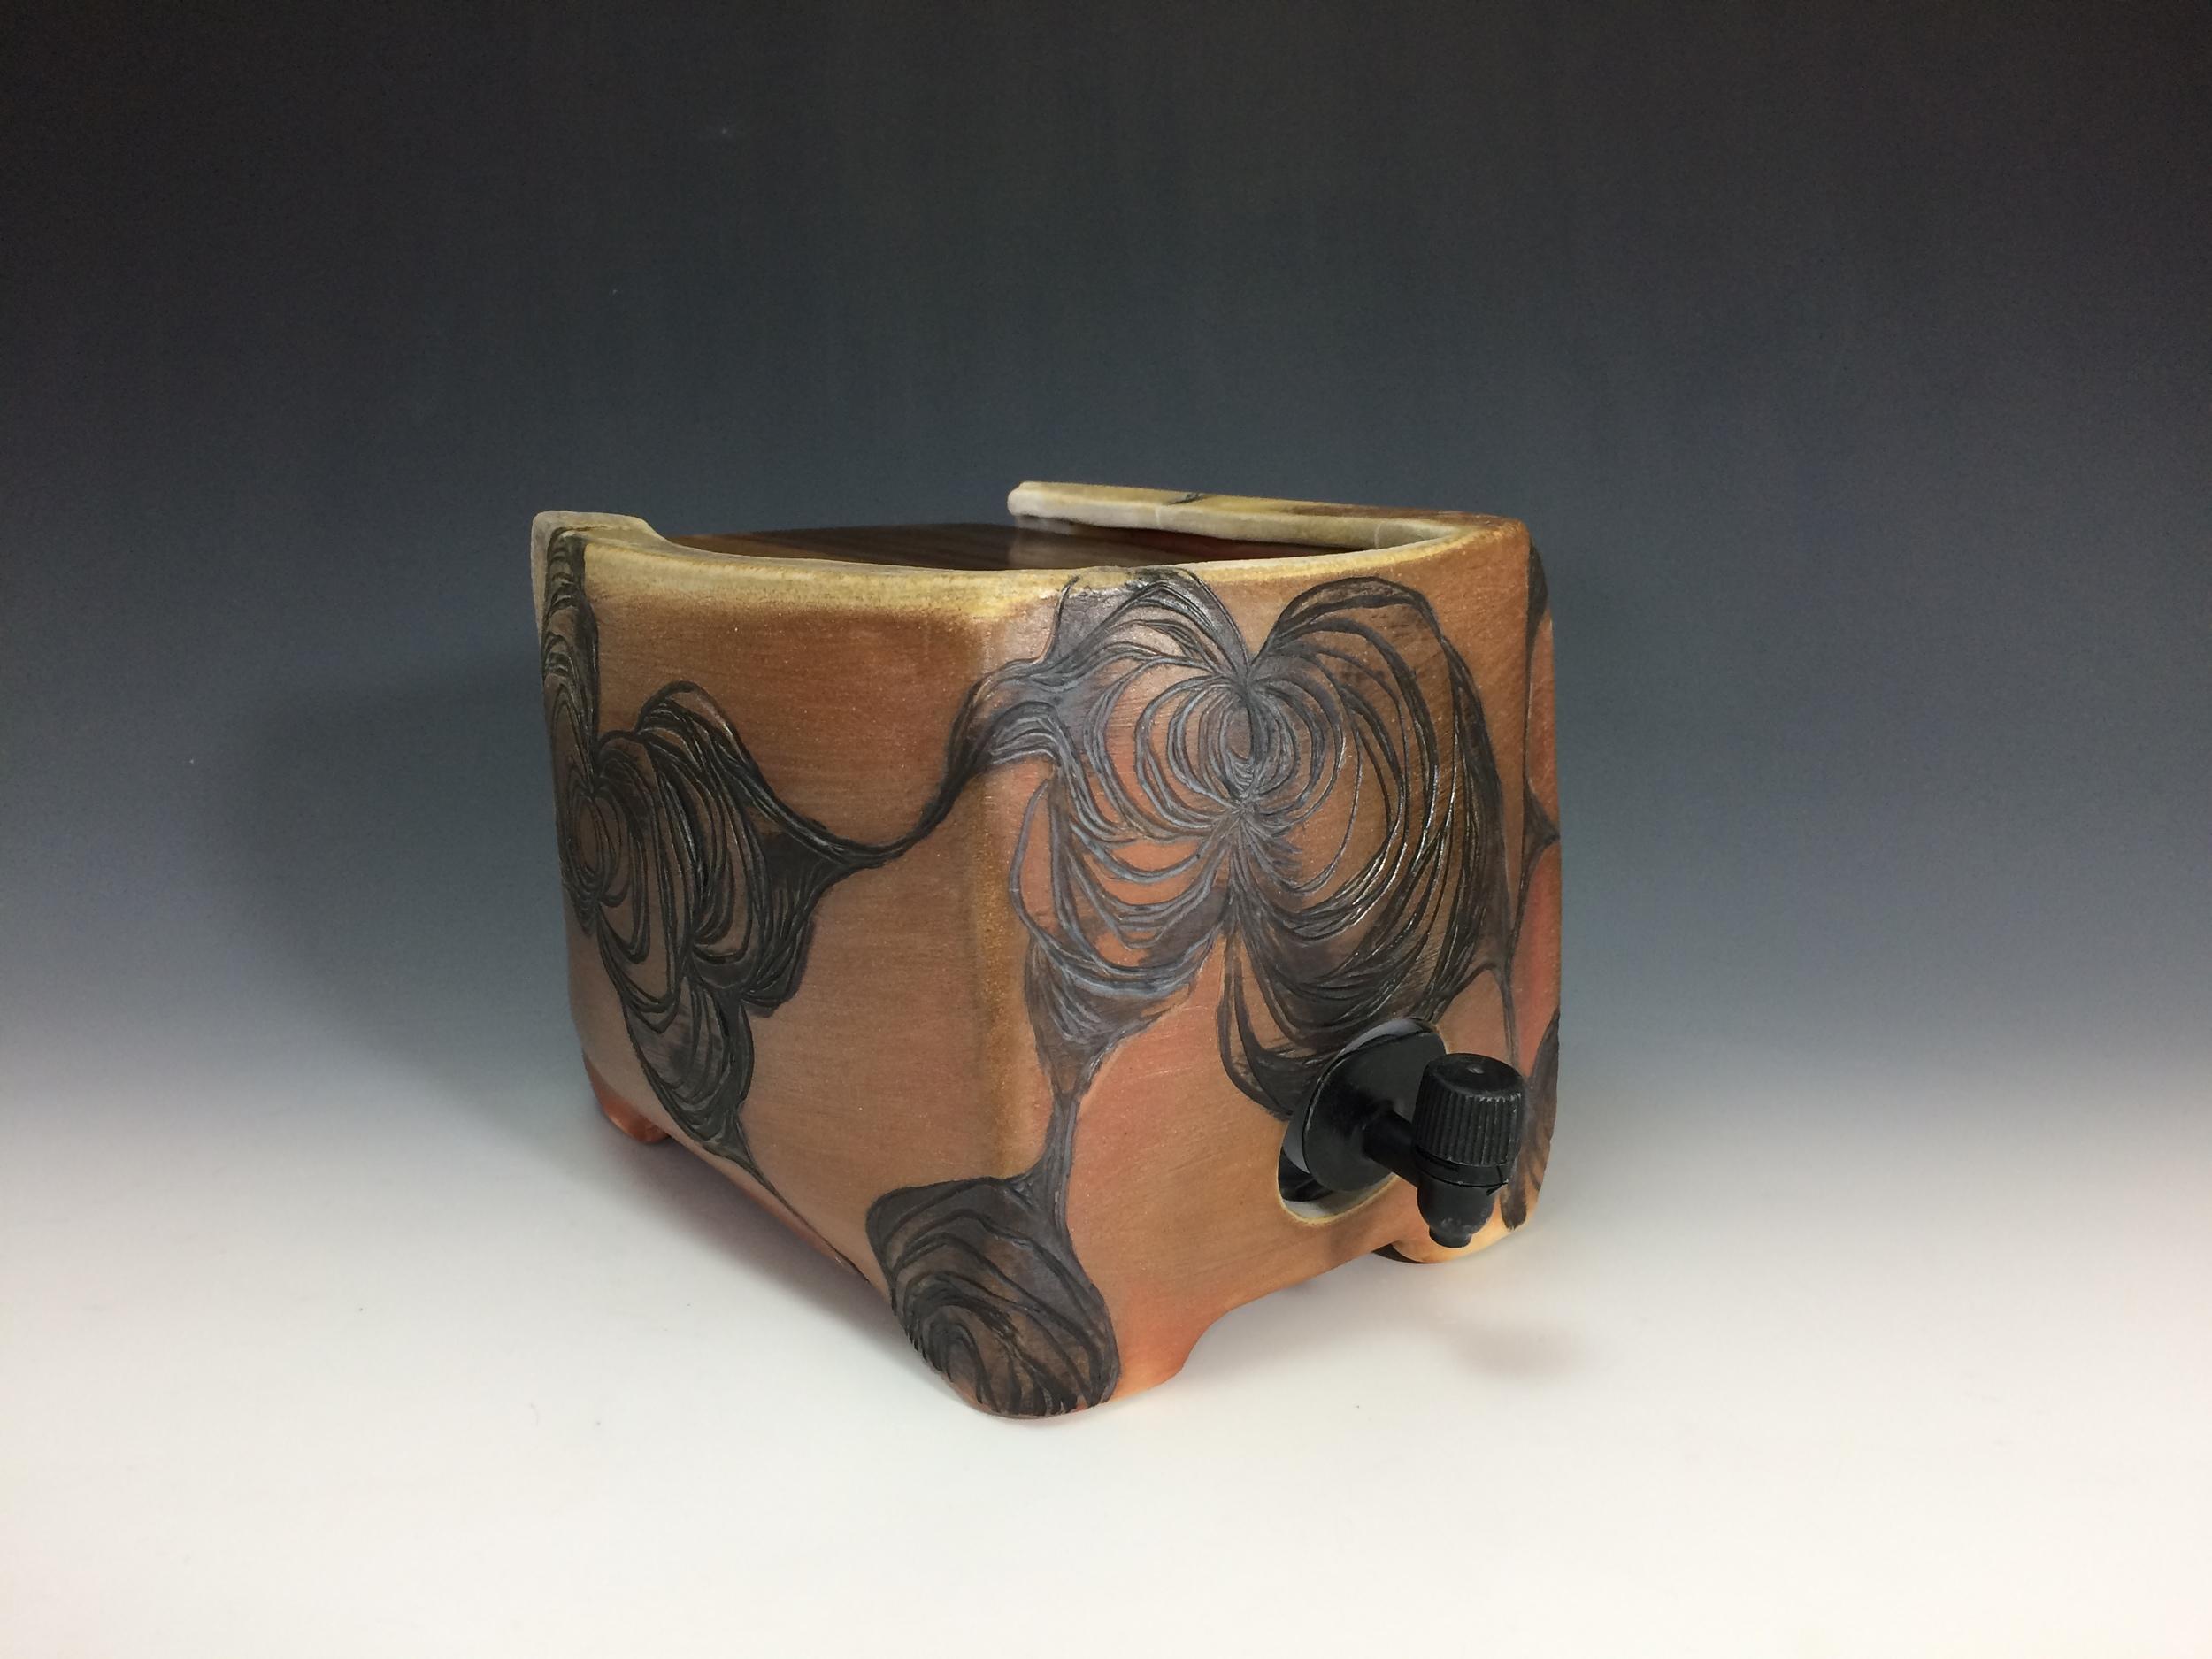 Ceramic, Wood, Boxed Wine